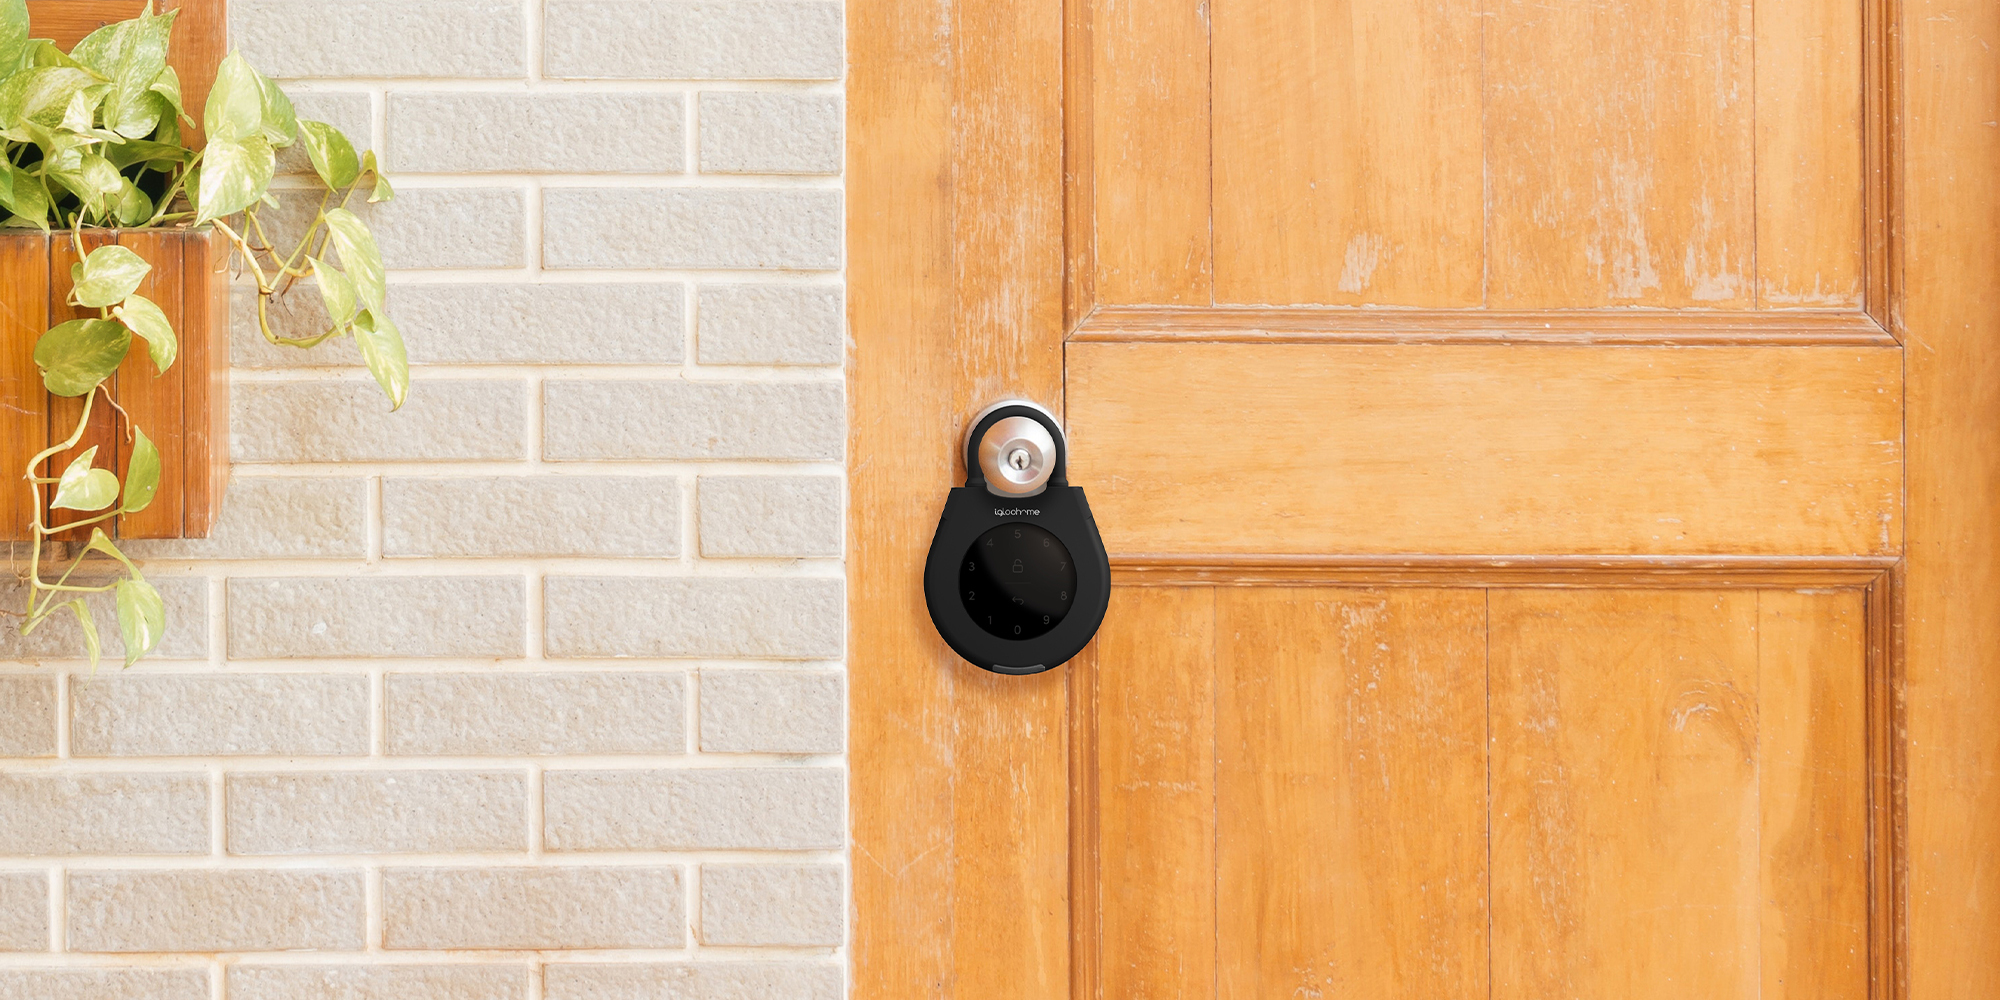 Igloohome smart keybox hanging from the door handle